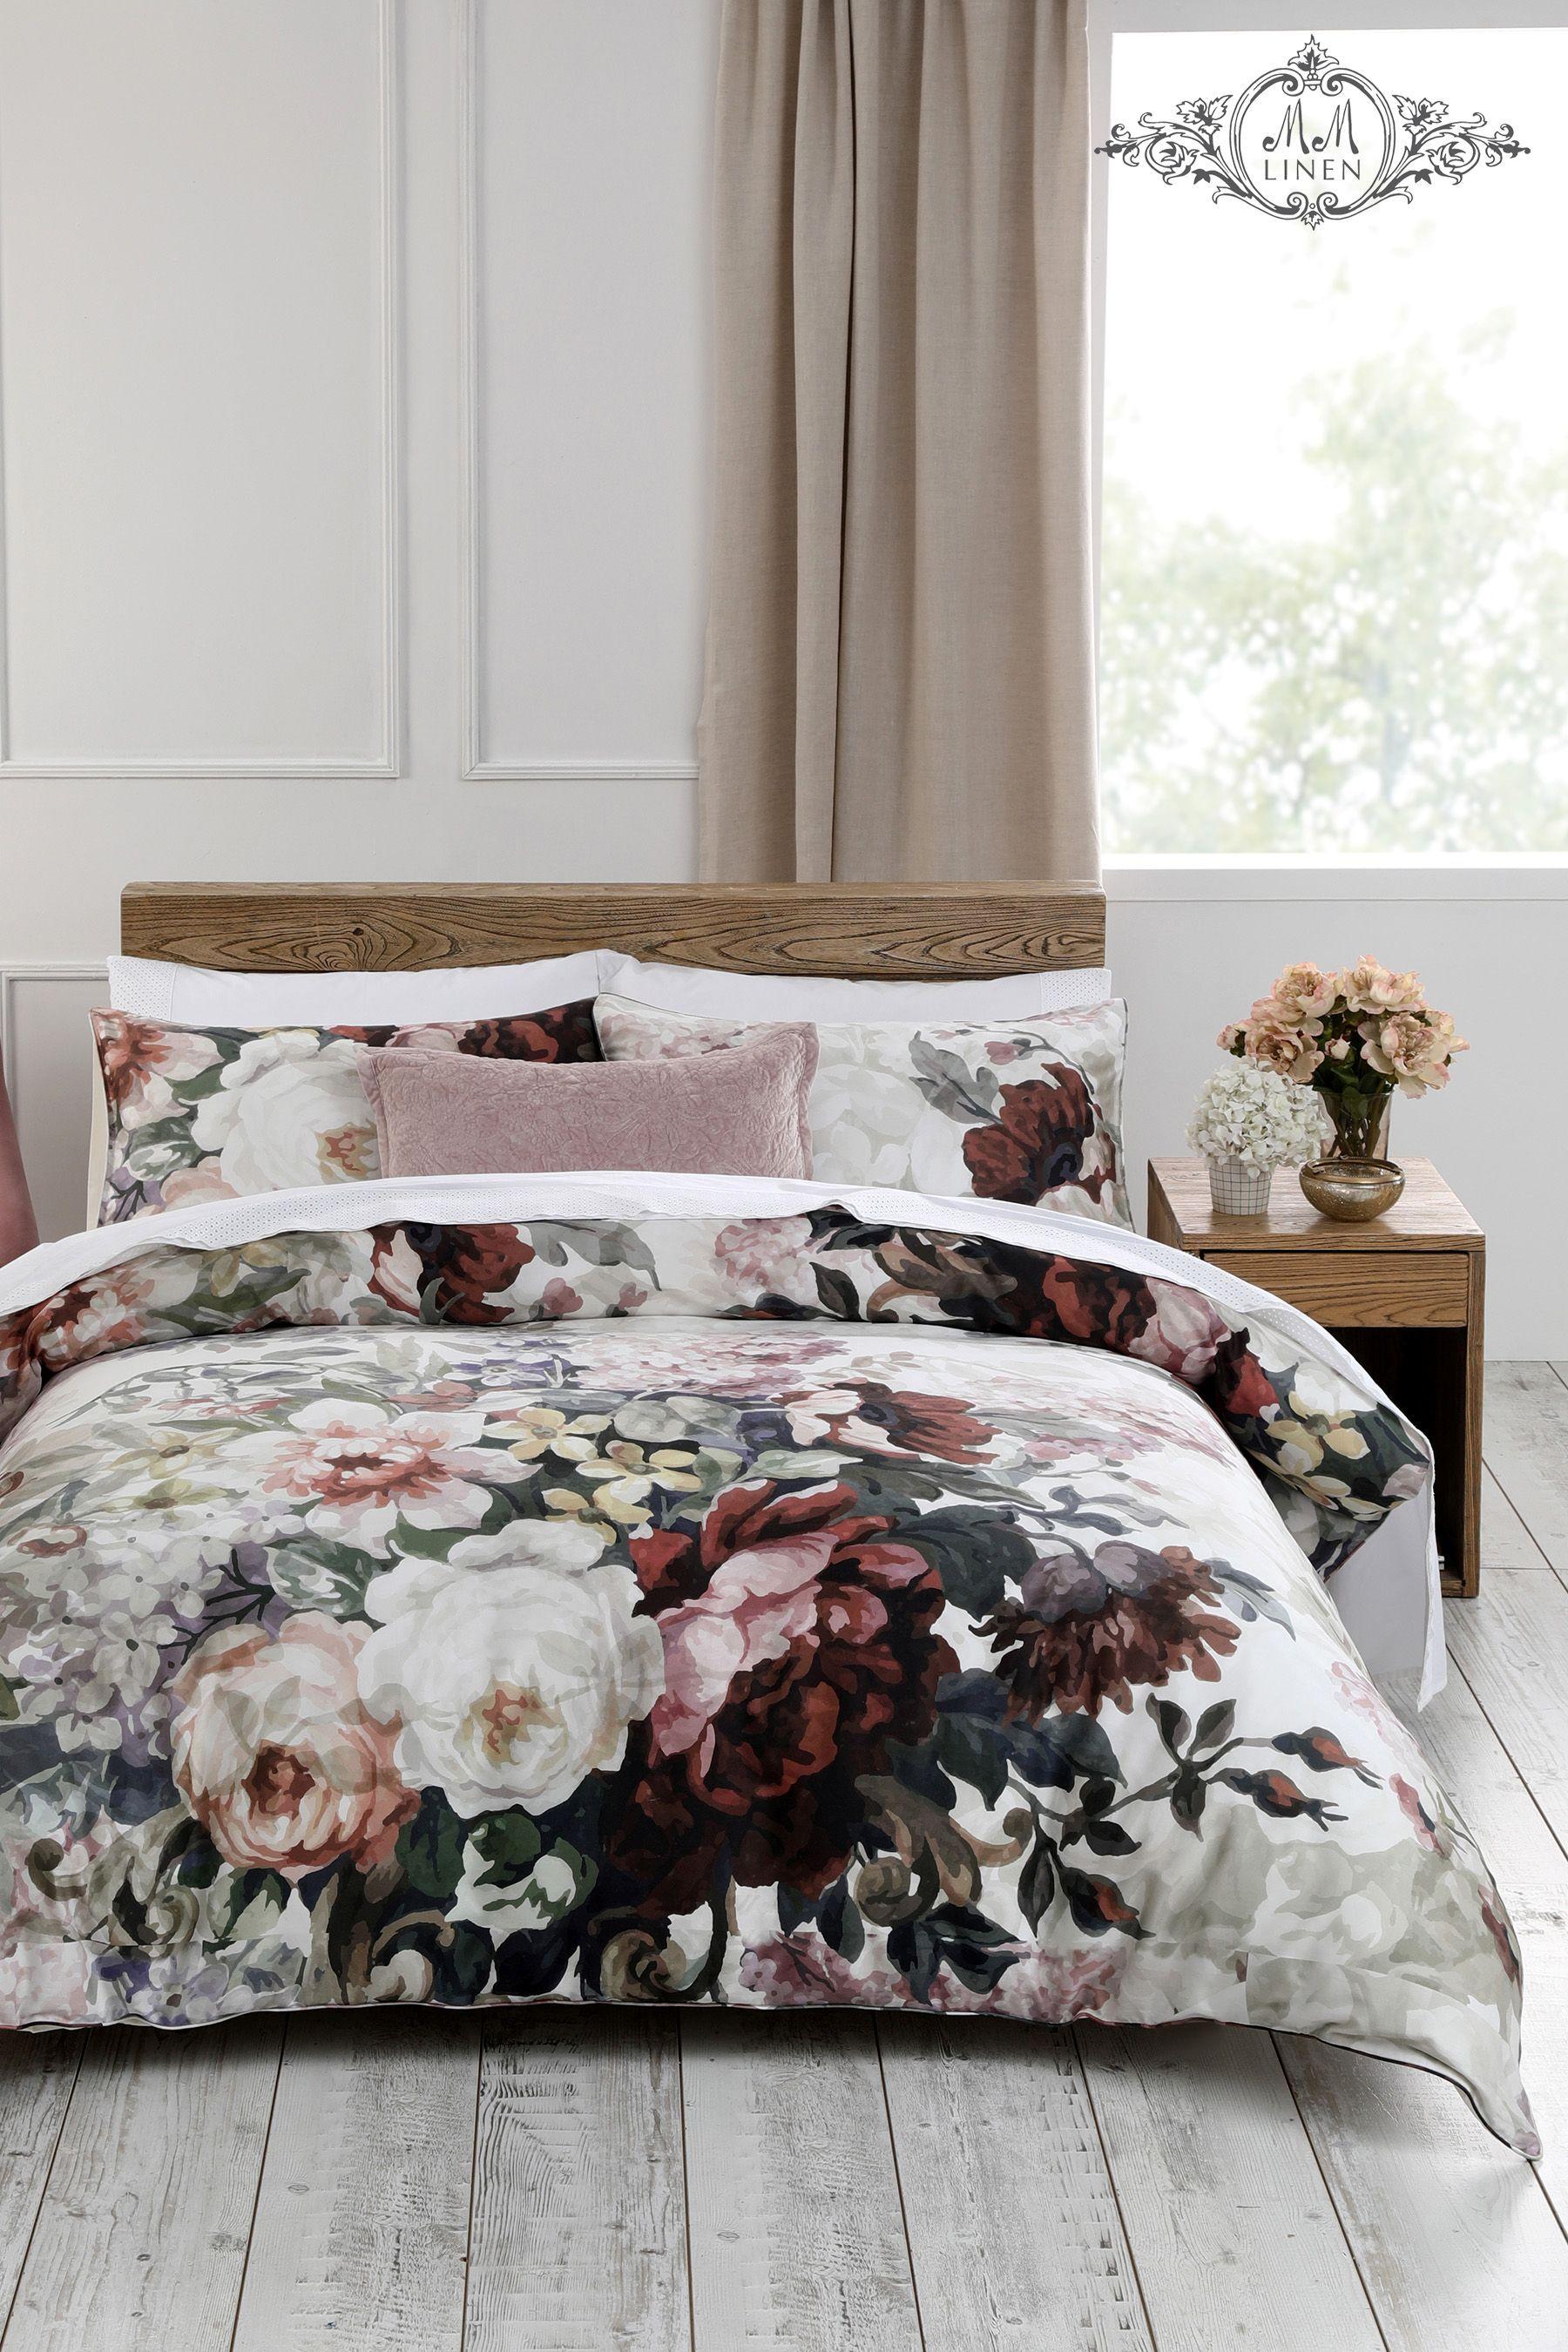 Mm Linen Lizzi Floral Cotton Duvet Cover And Pillowcase Set Bed